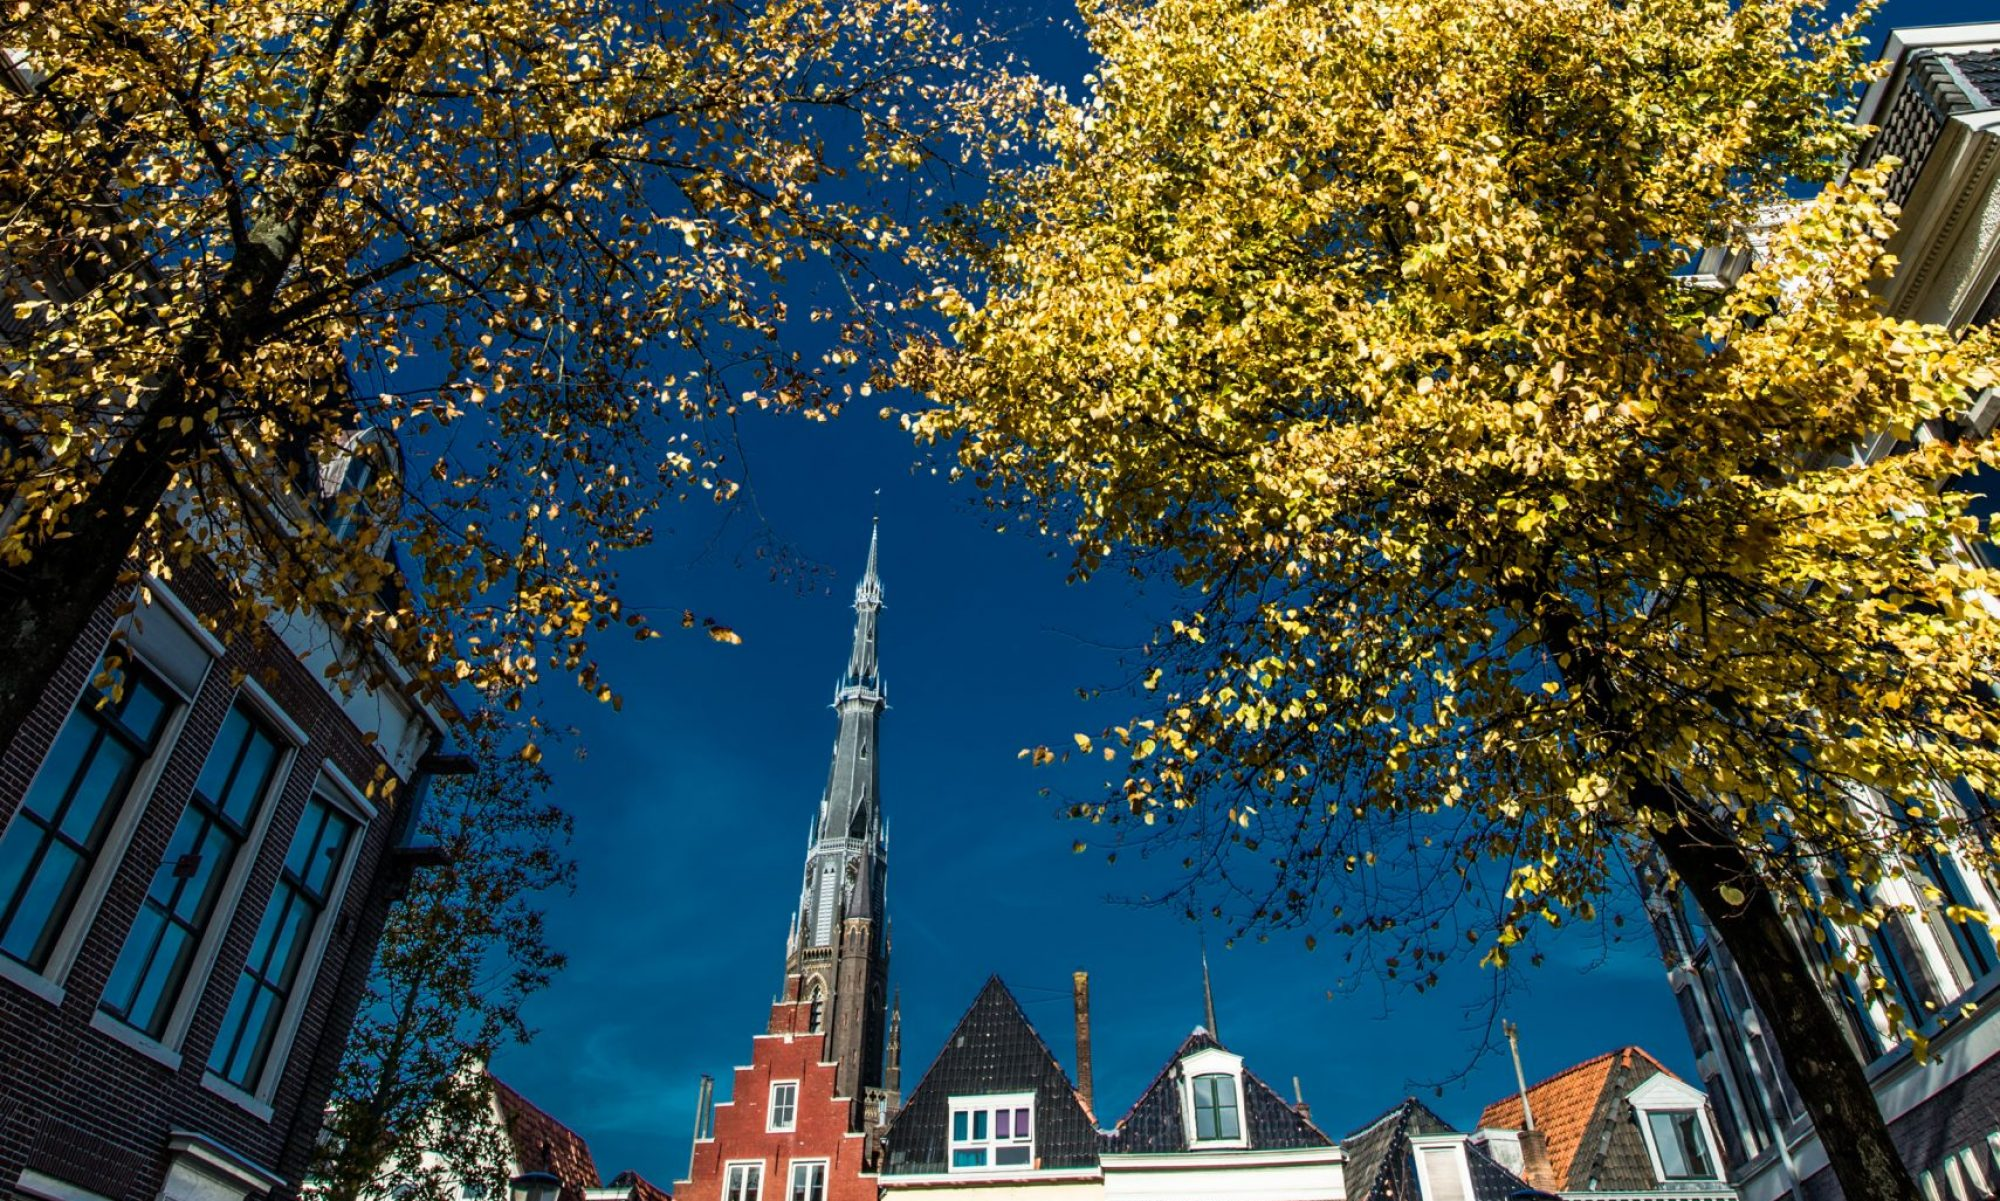 Bomenridders Leeuwarden